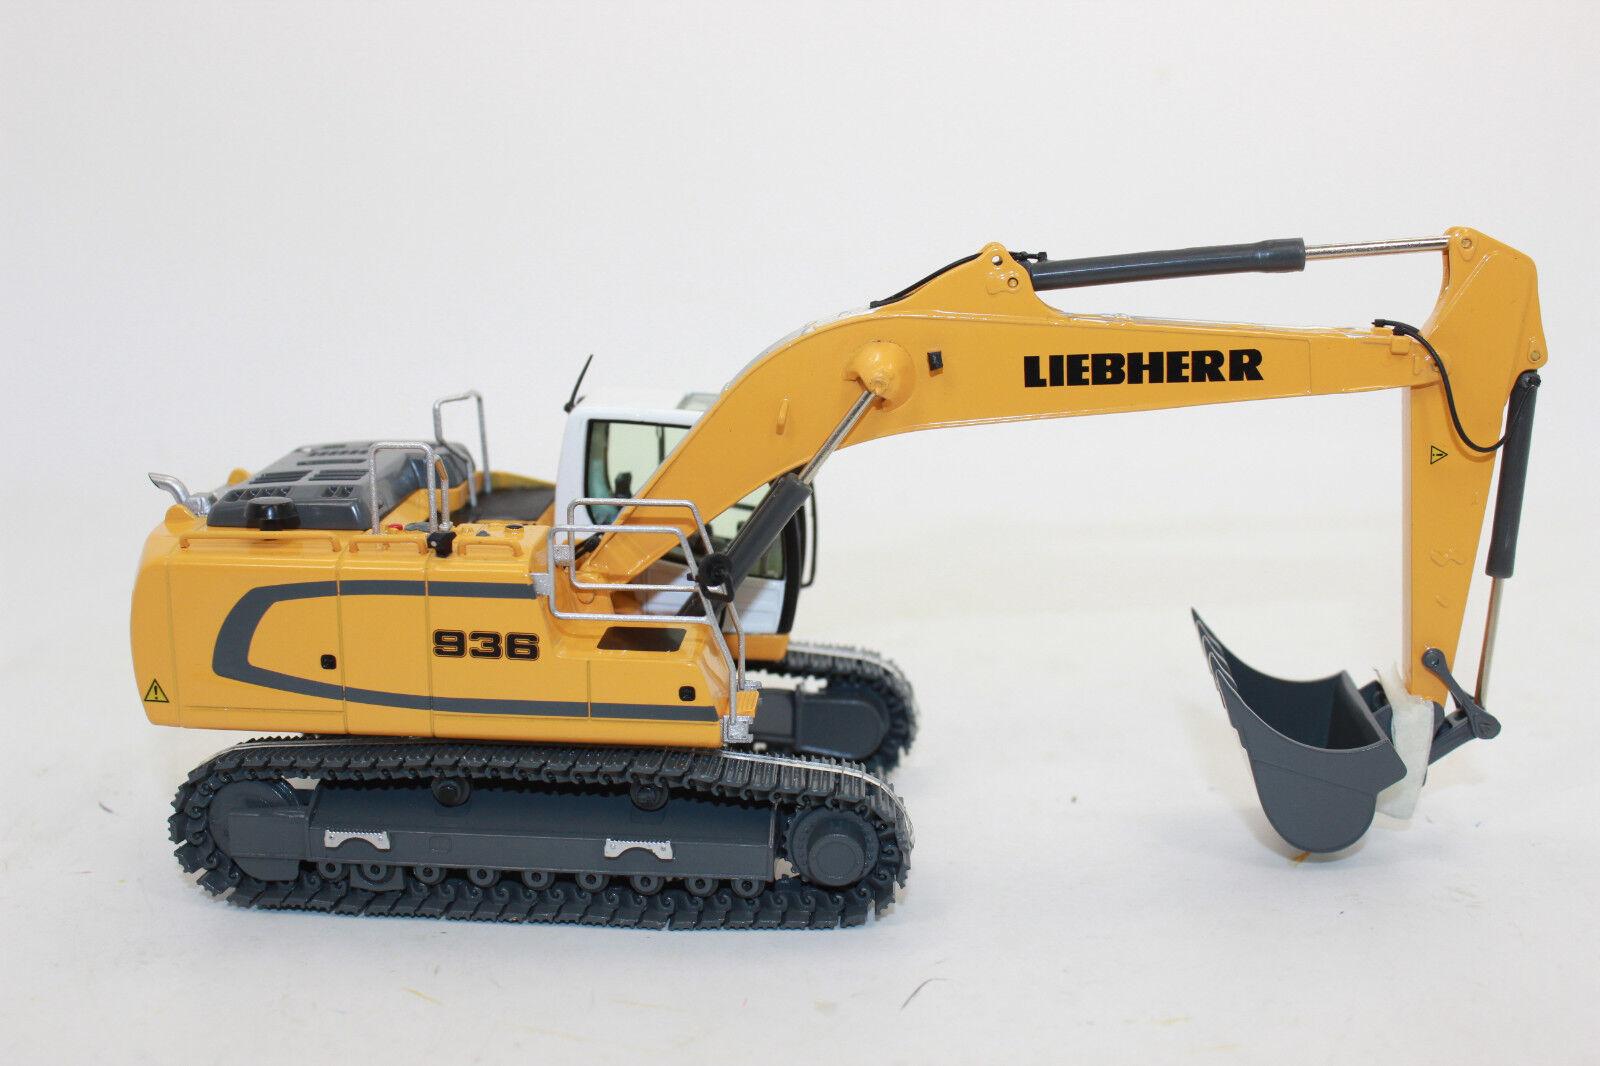 Nzg 957 Liebherr R 936 936 936 Crawler Excavator Animal IV 1 50 New Original Packaging 9c2